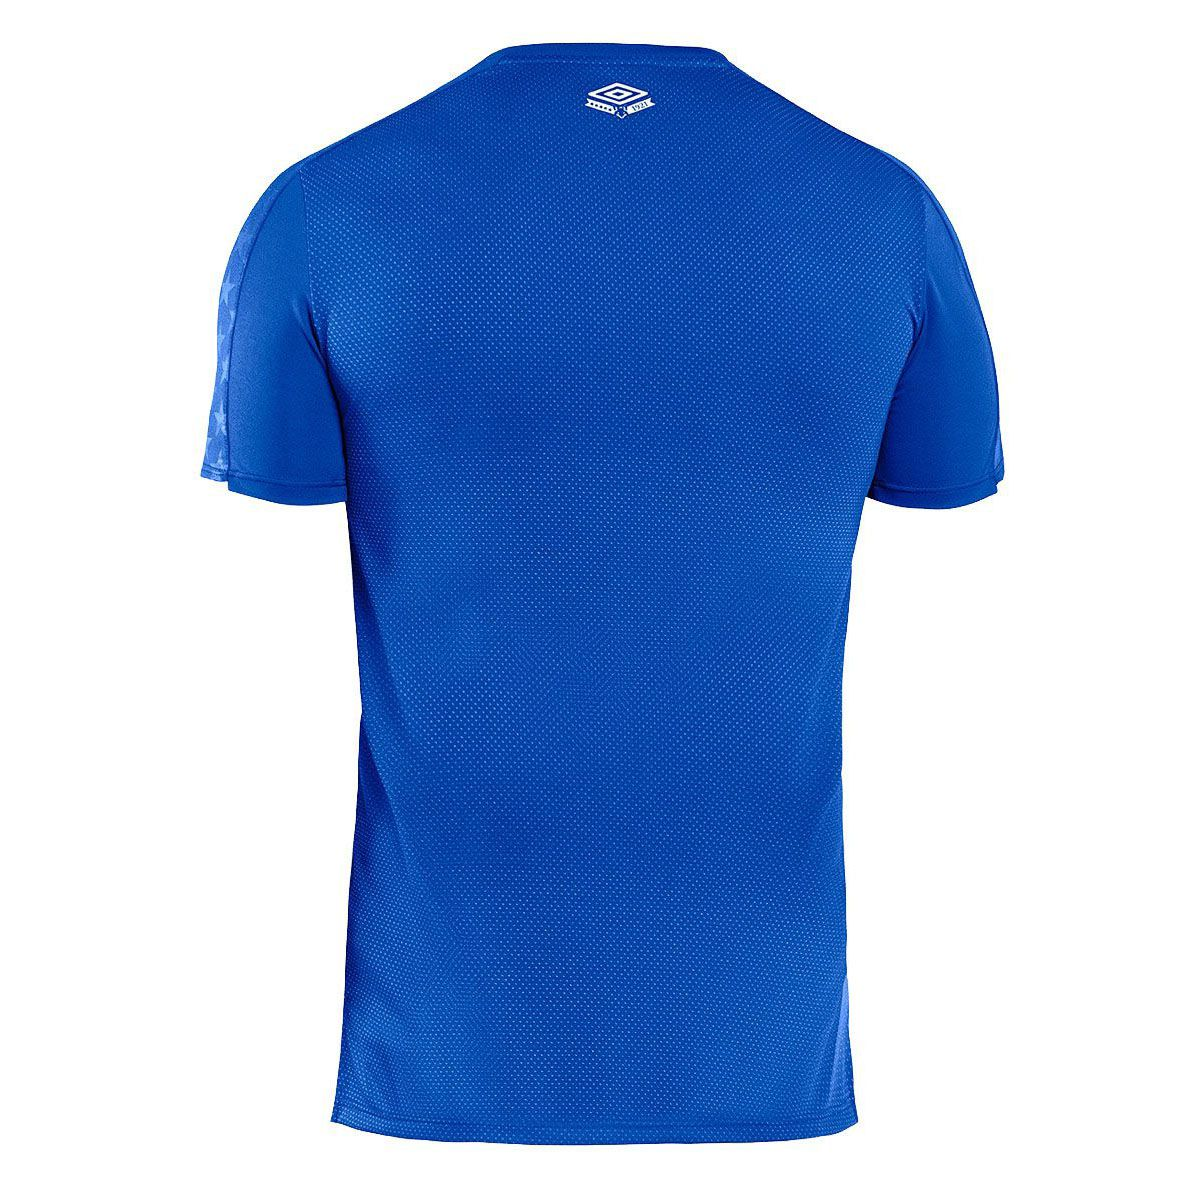 Camisa Cruzeiro I 19/20 s/n° Umbro Torcedor Masculina